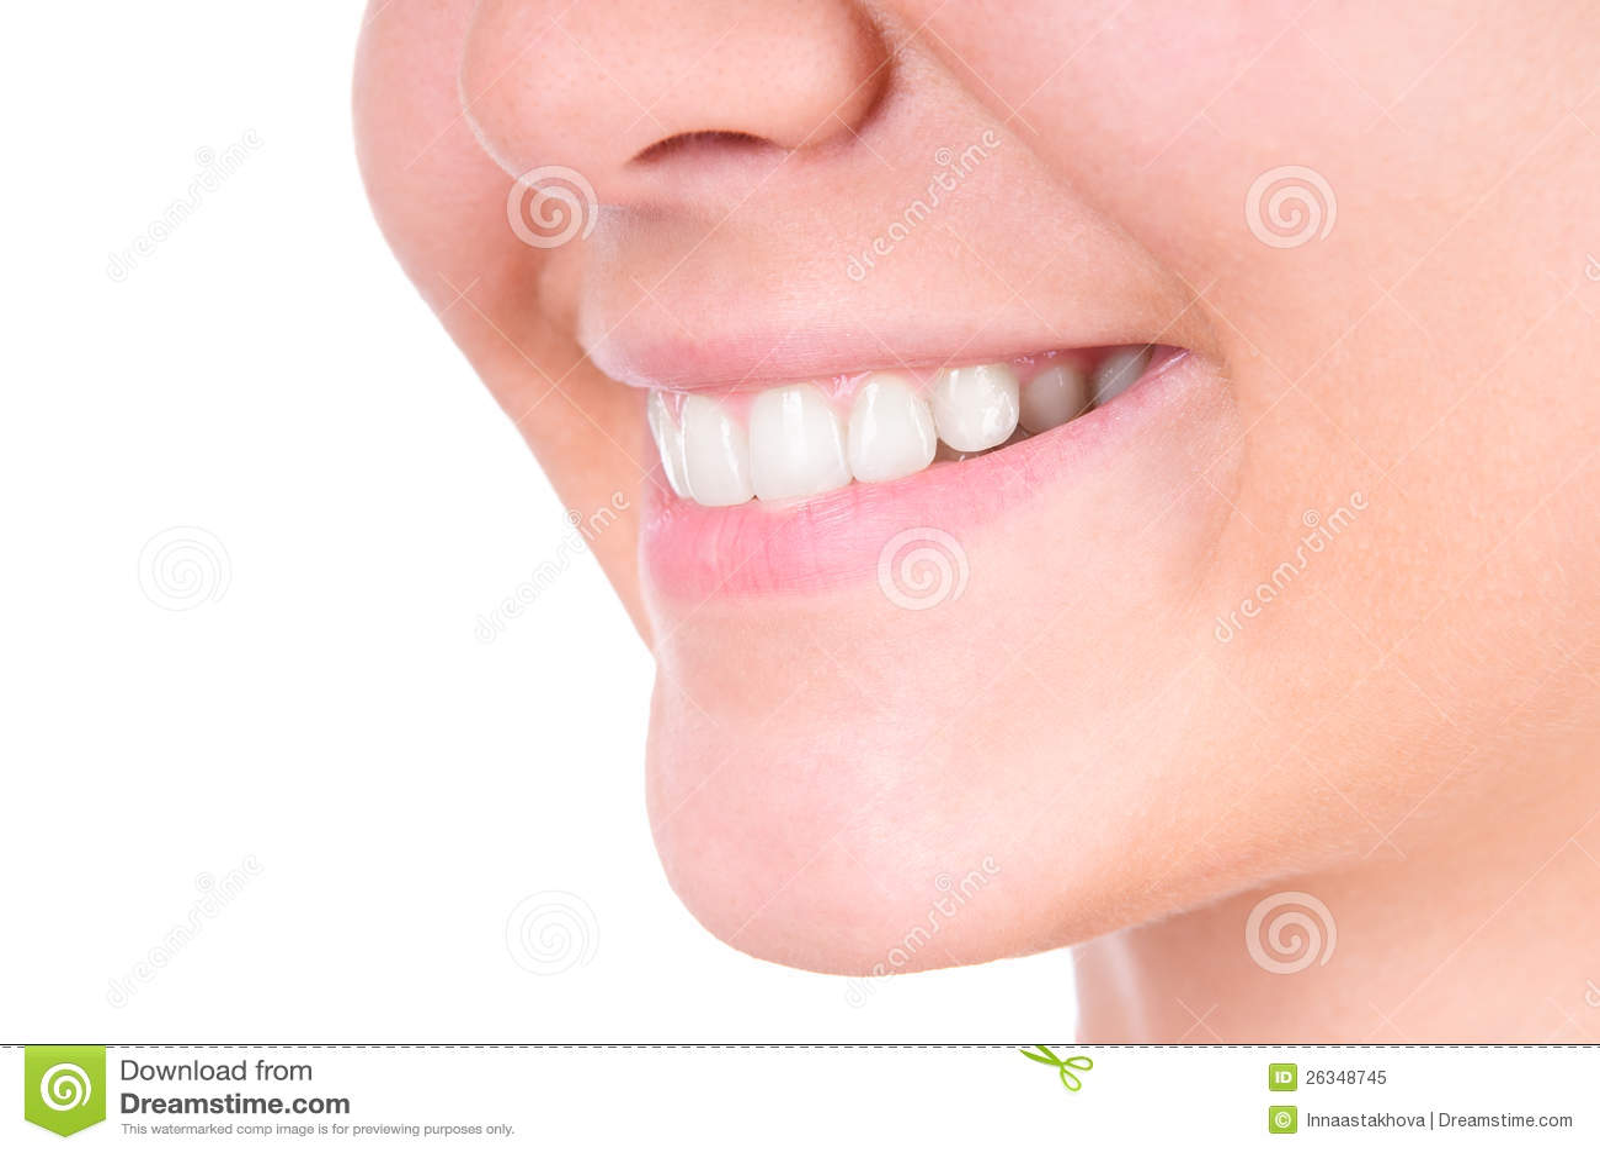 Teeth whitening. Dental care